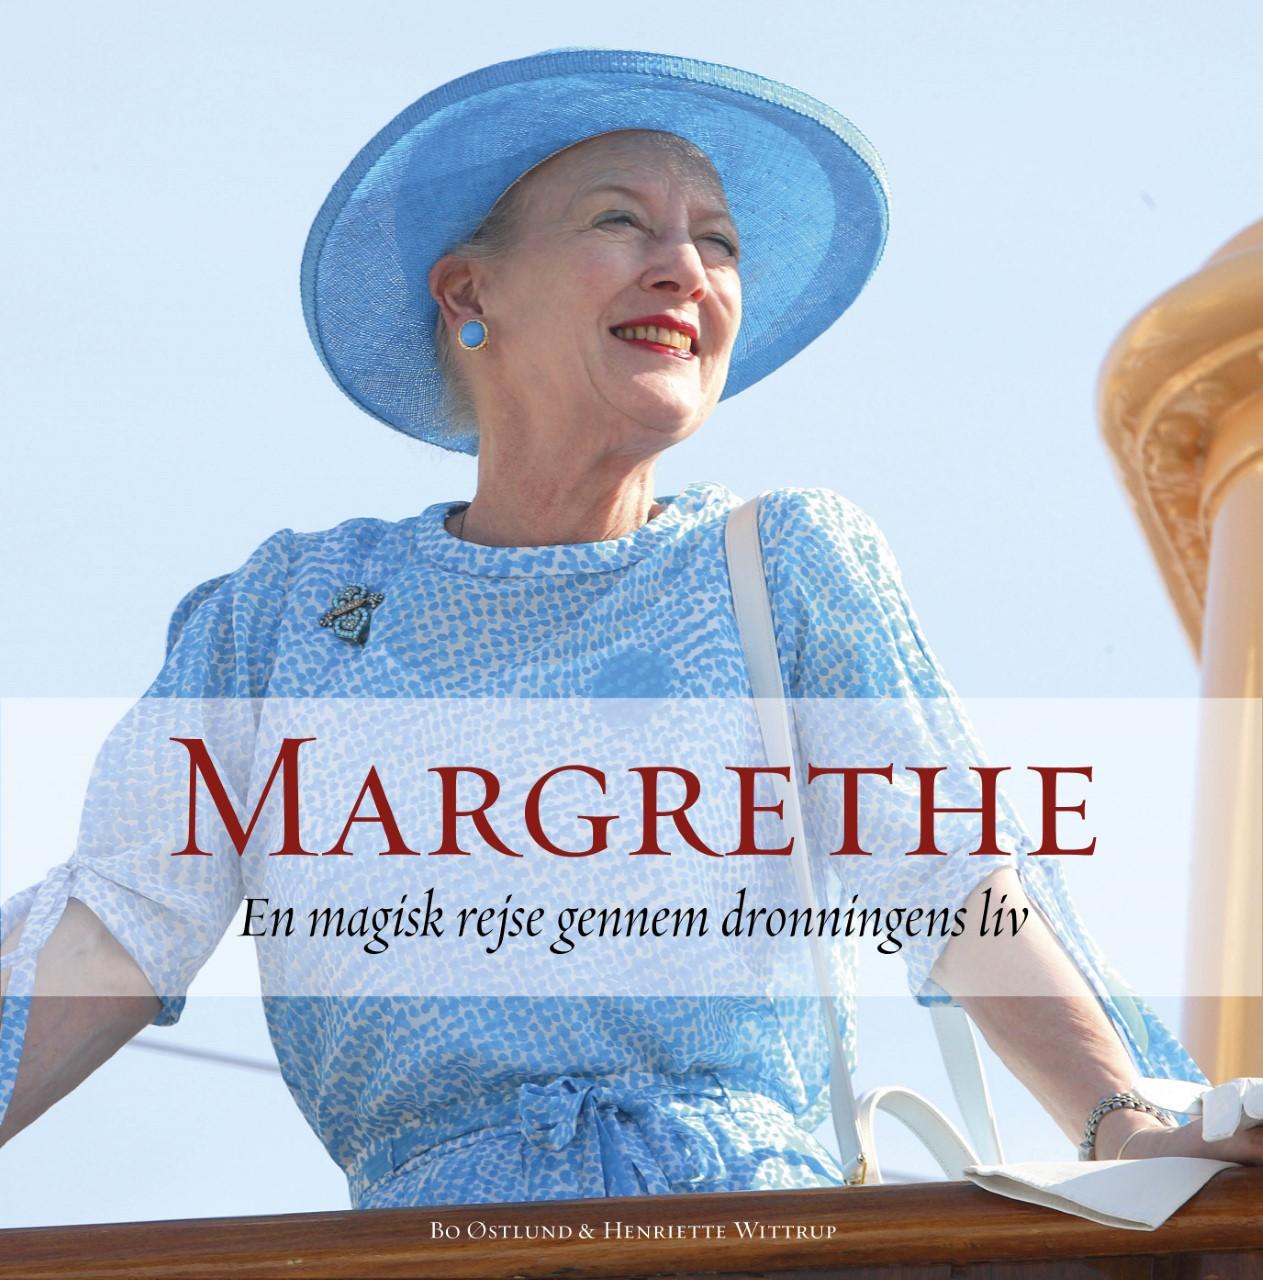 Margrethe - Bo Østlund & Henriette Wittrup - Bøger - Forlaget Heatherhill - 9788791901164 - 30/3-2020